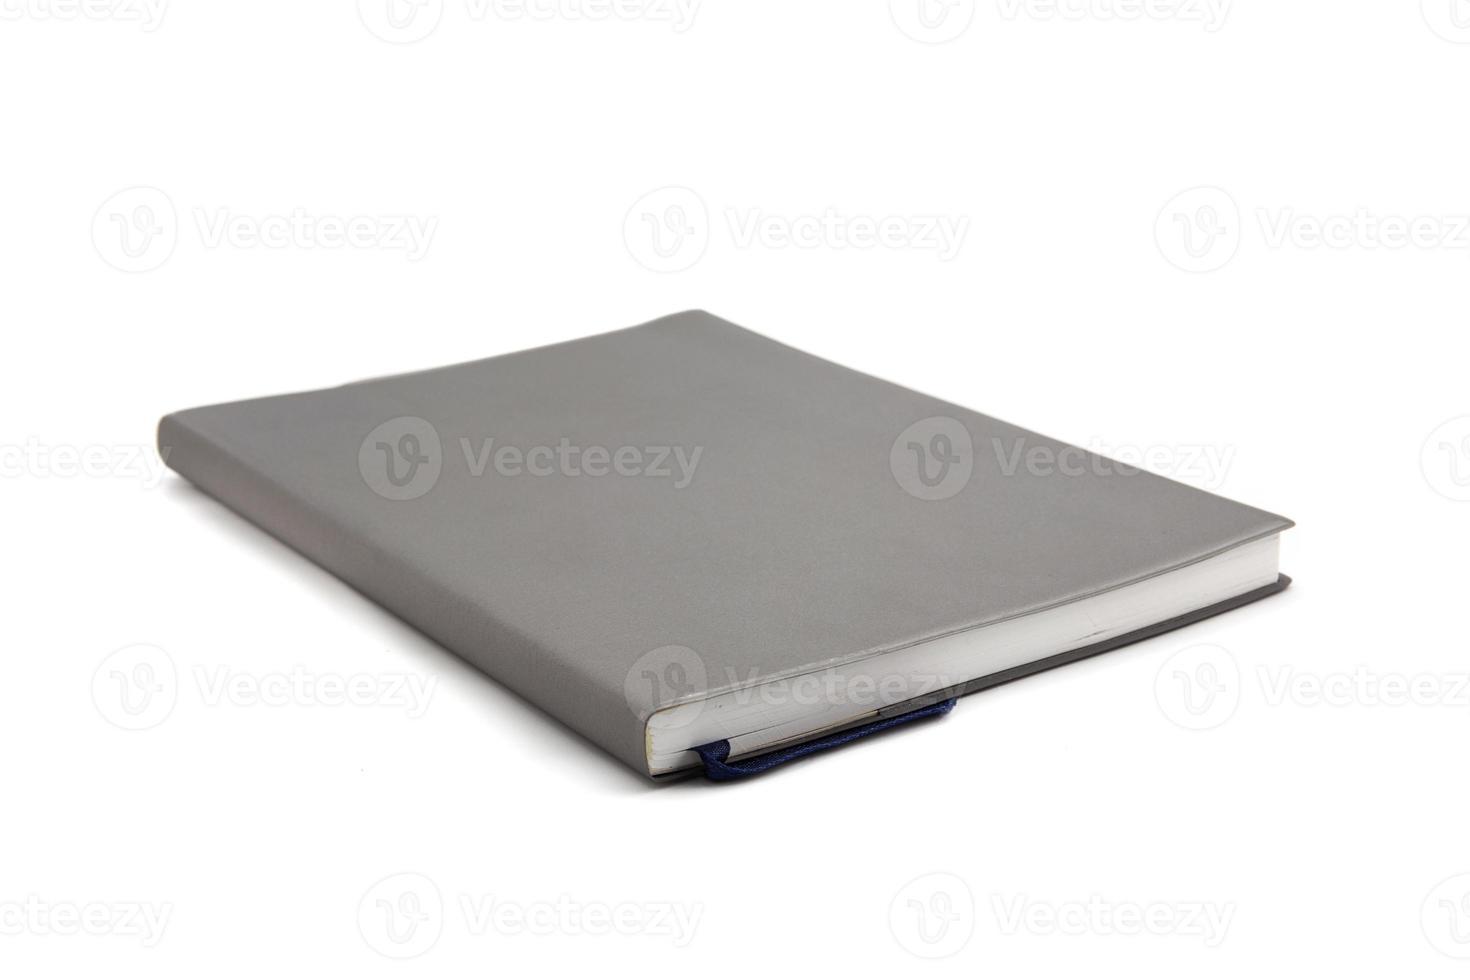 livre blanc sur fond blanc. photo